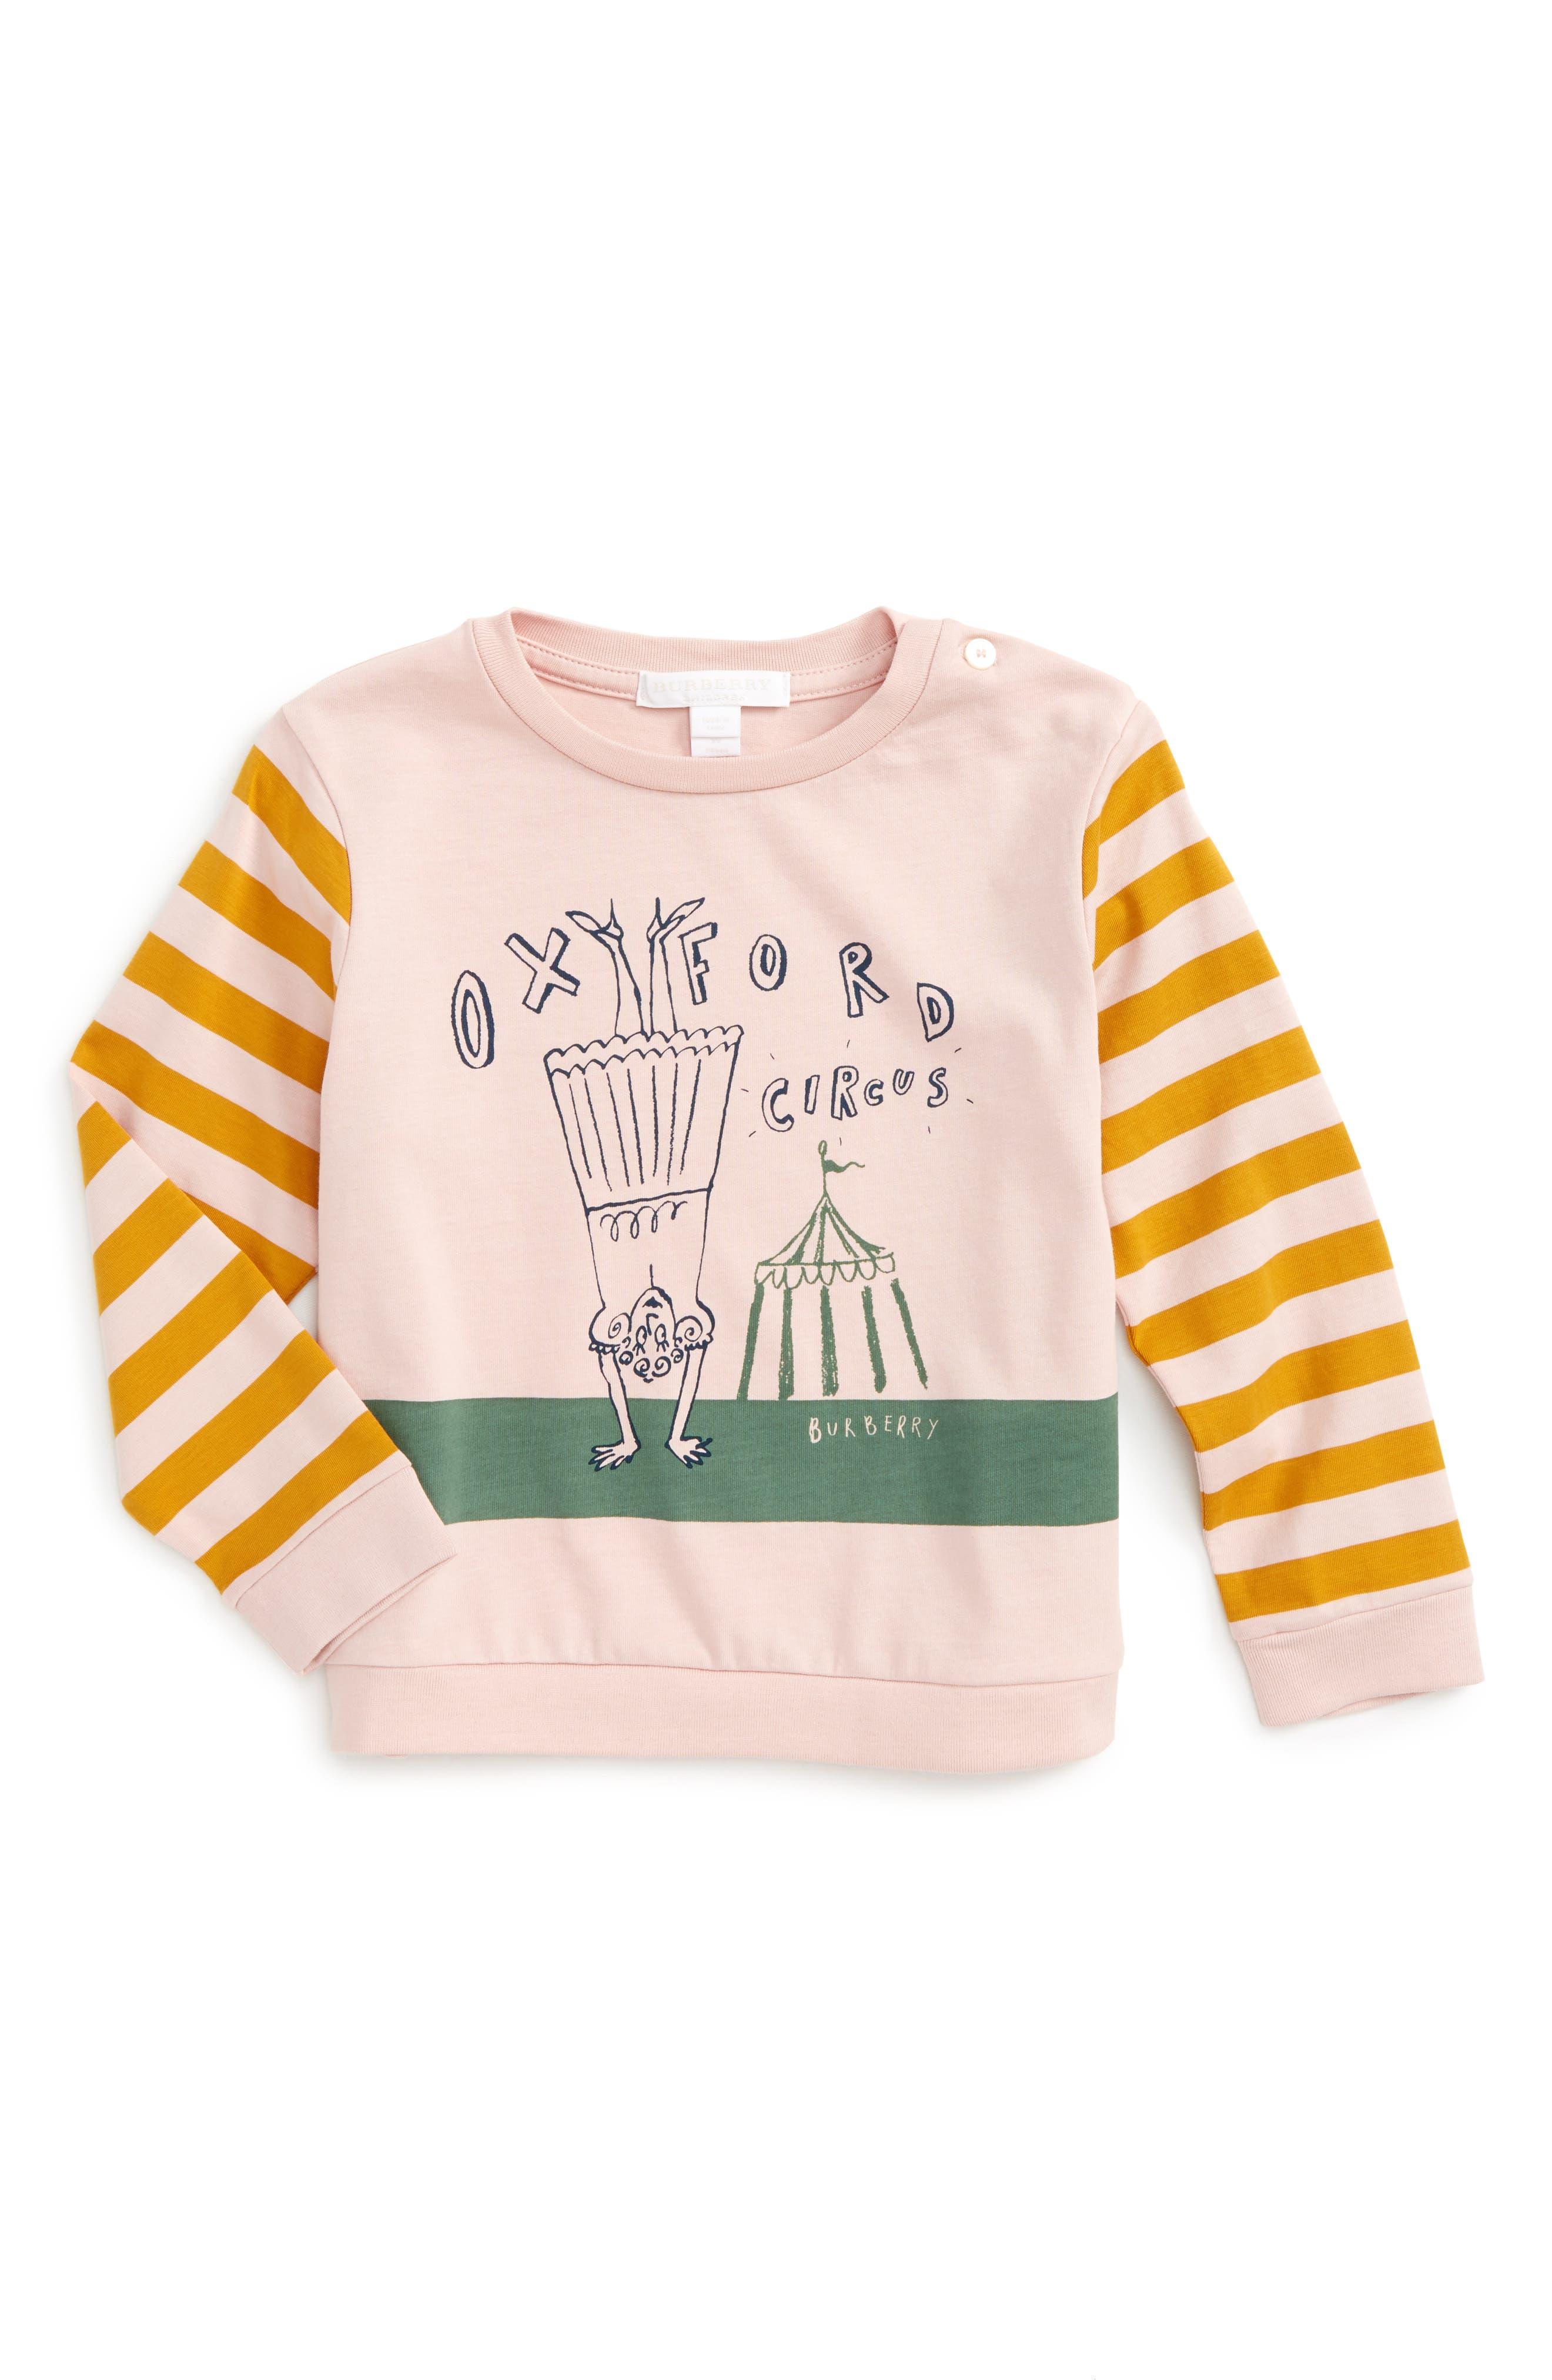 Burberry London Icons Graphic Cotton Tee (Toddler Girls, Little Girls & Big Girls)